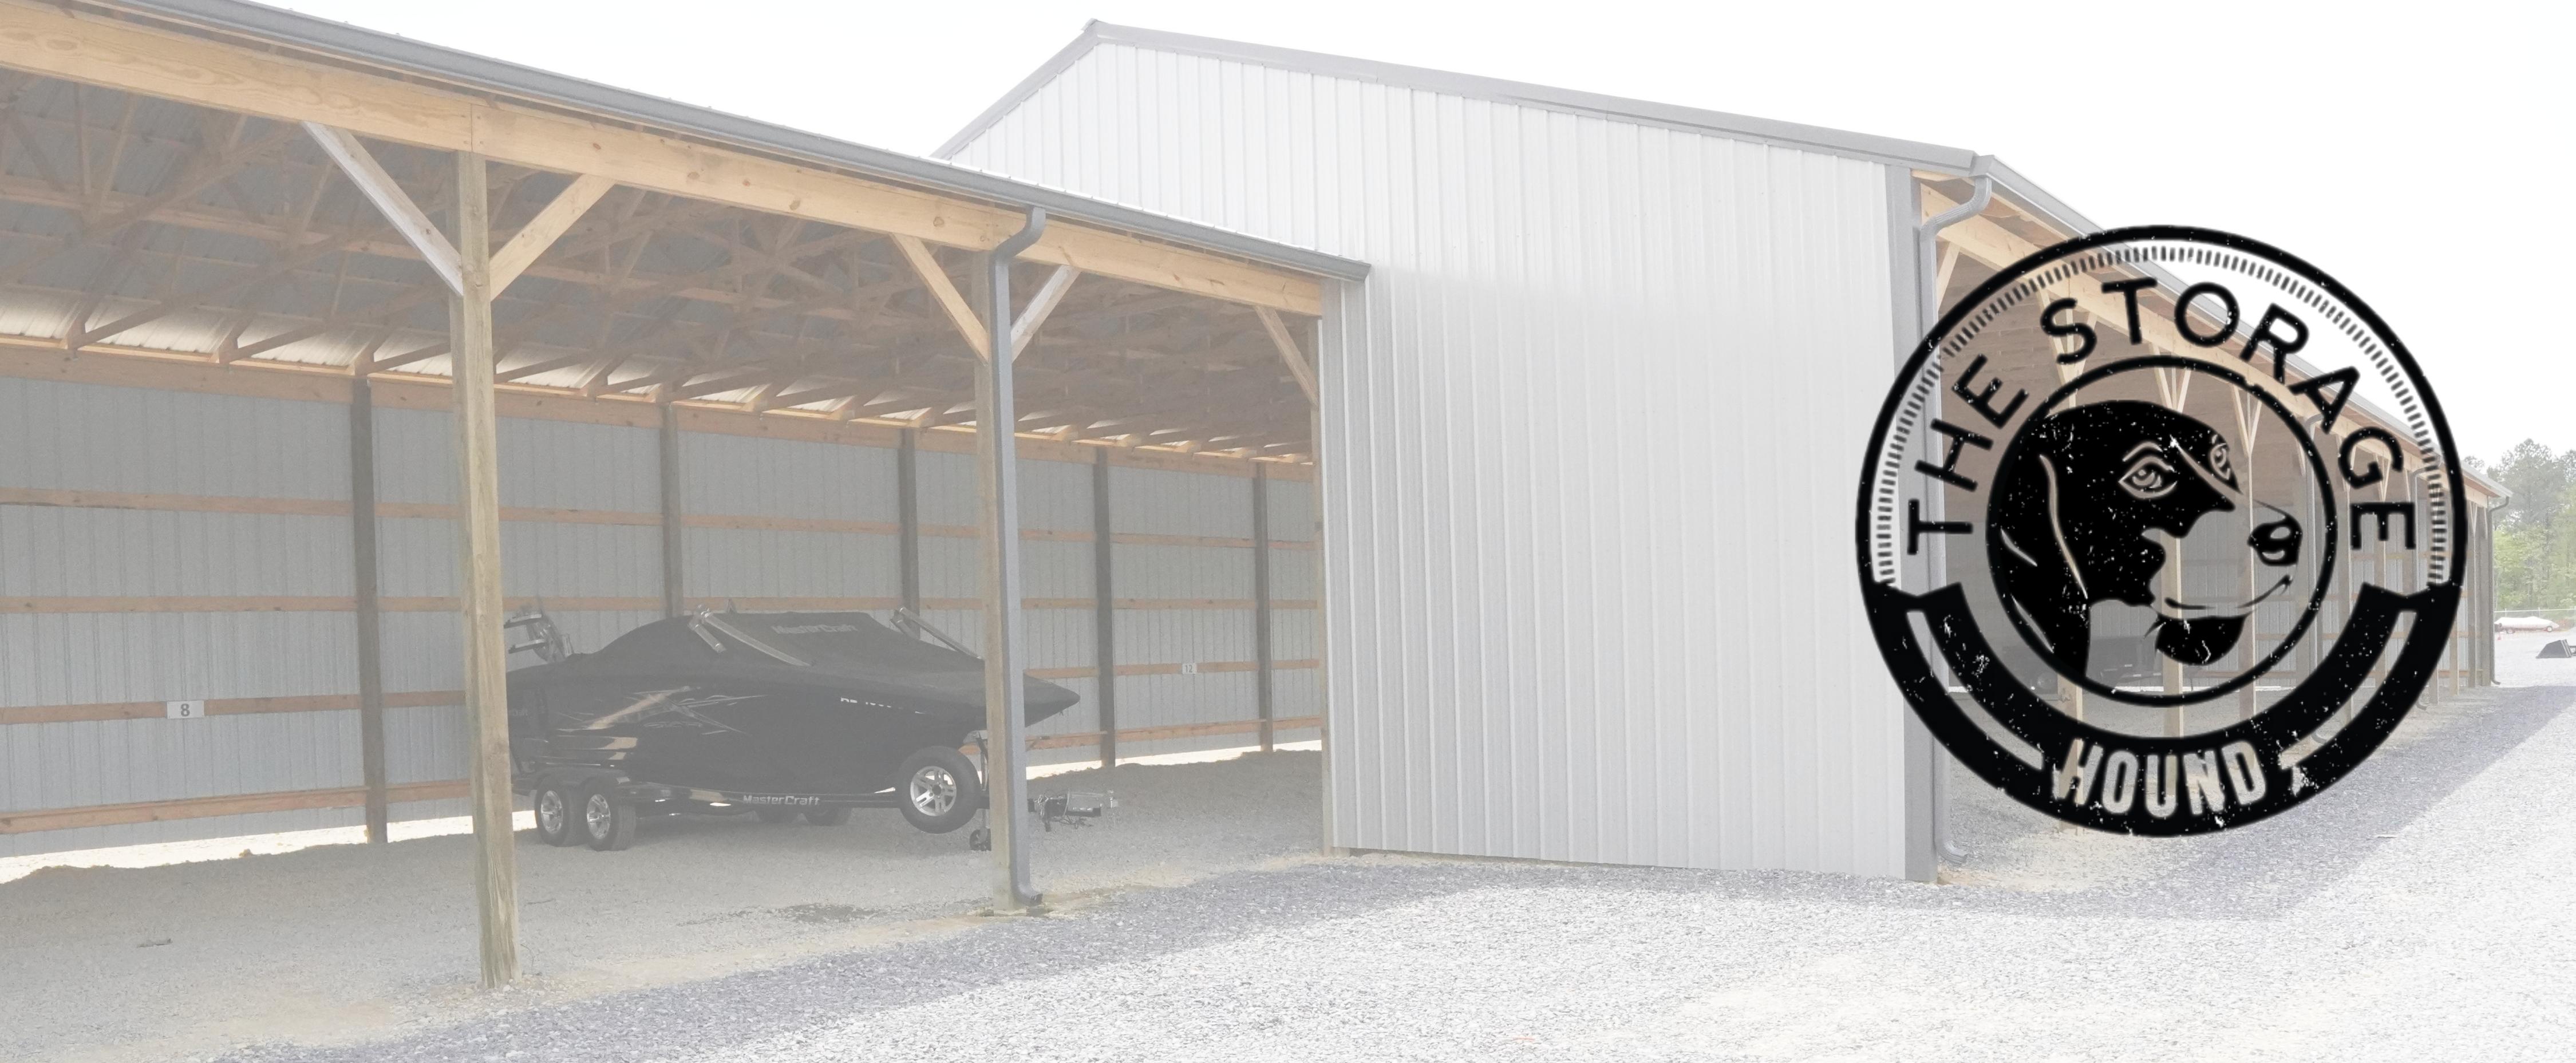 The Storage Hound Covered Parking